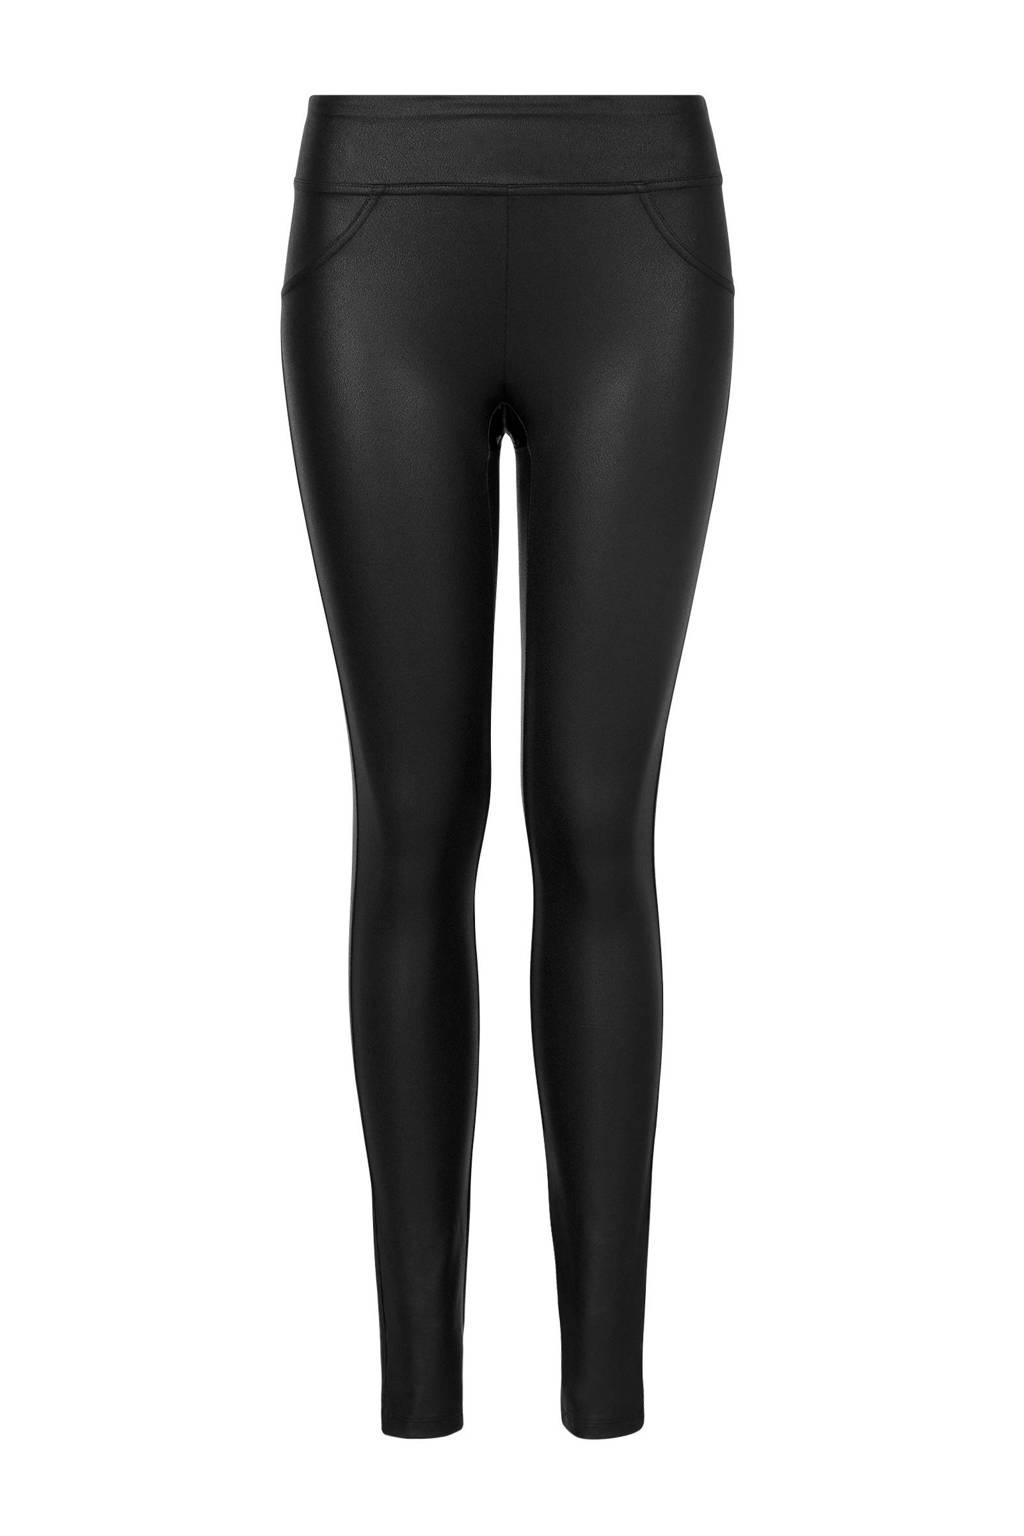 PROMISS legging zwart, Zwart